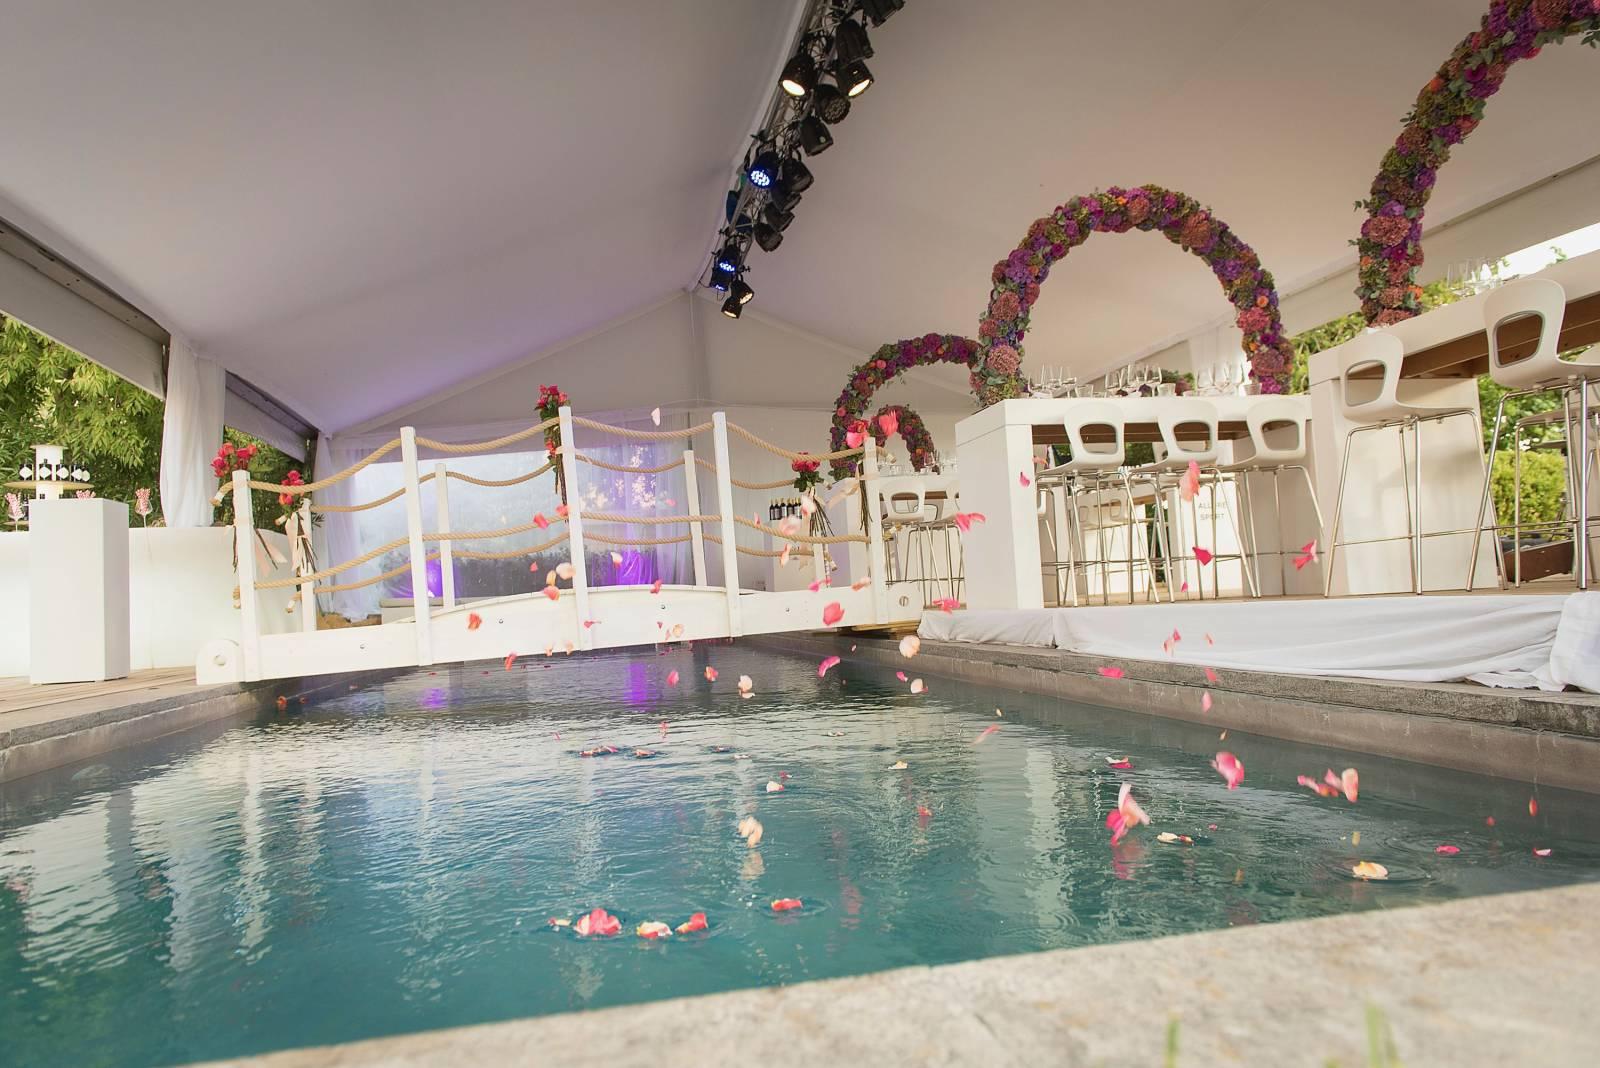 Feriatus - Wedding planner - House of Weddings  - 2